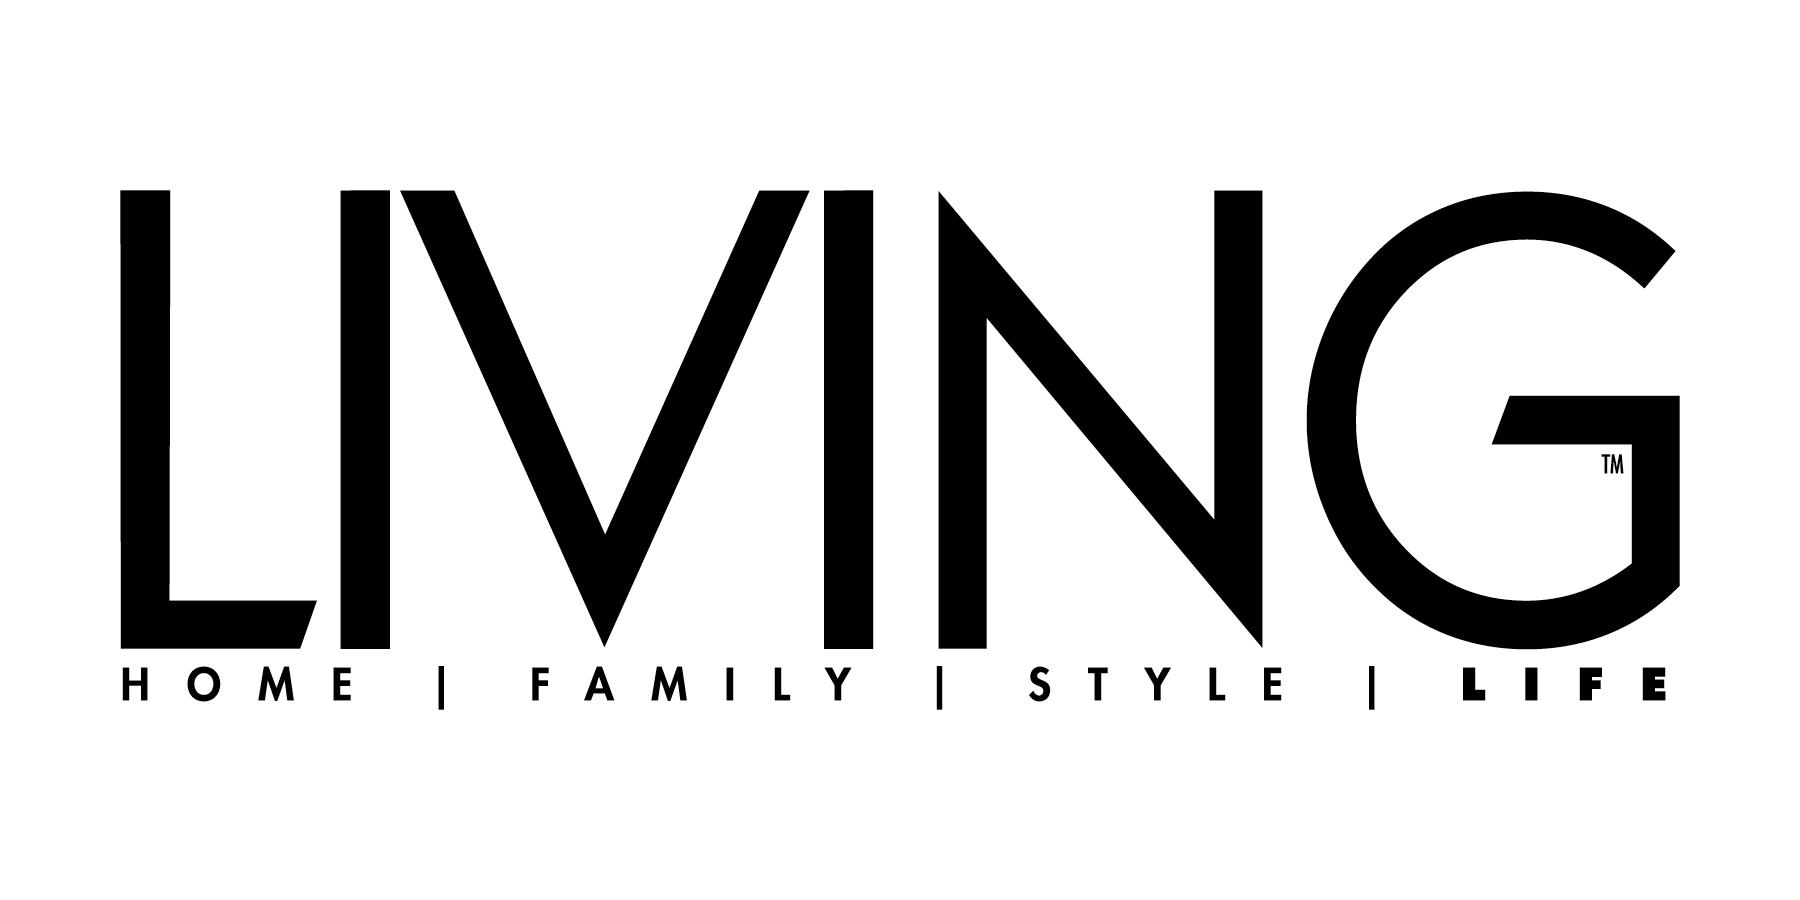 http://www.livingmagazine.net/classic-cuts-modern-man/